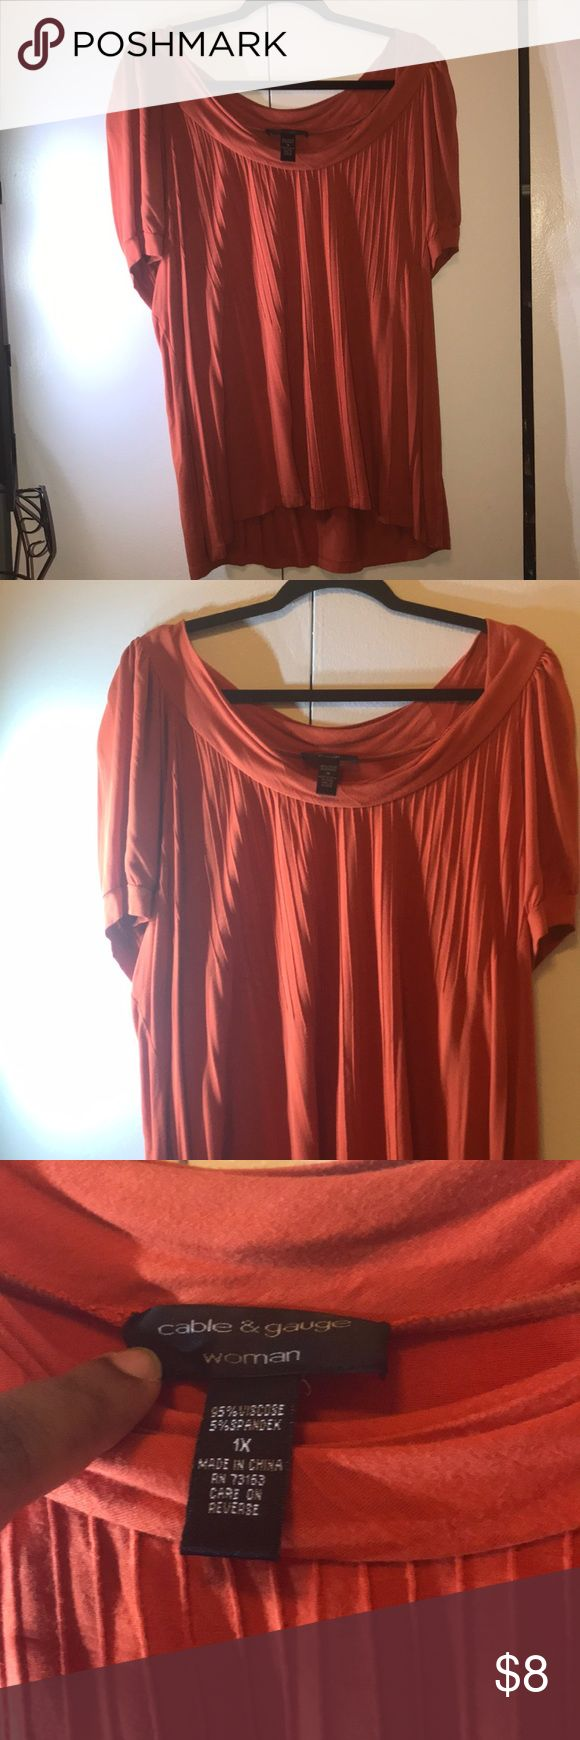 Top Orange short sleeve top Cable & Gauge Tops Blouses